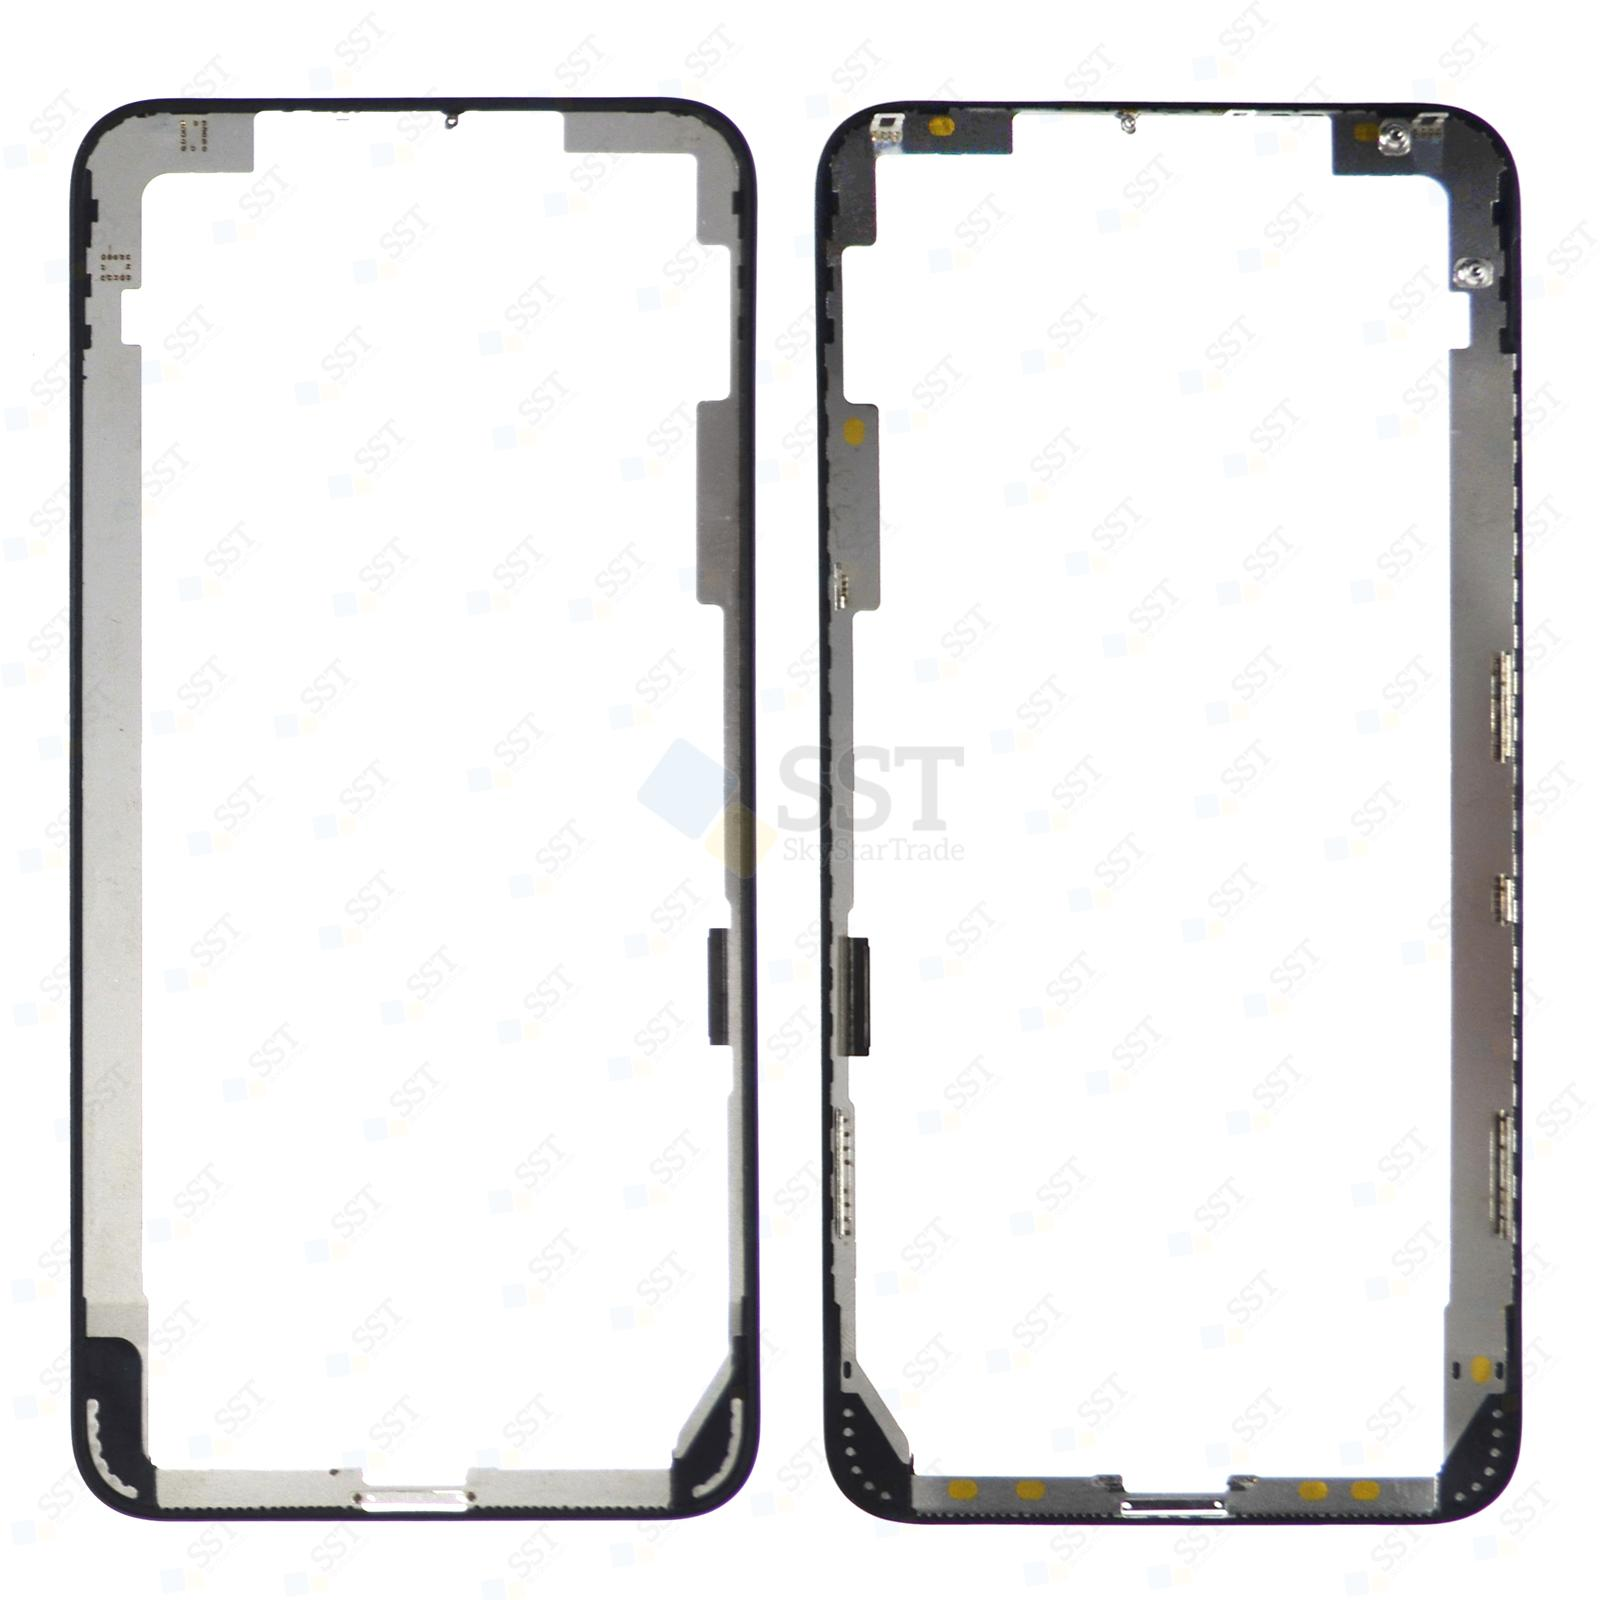 iPhone XS Max A1921 A2101 A2102 A2103 A2104 LCD Holder Frame